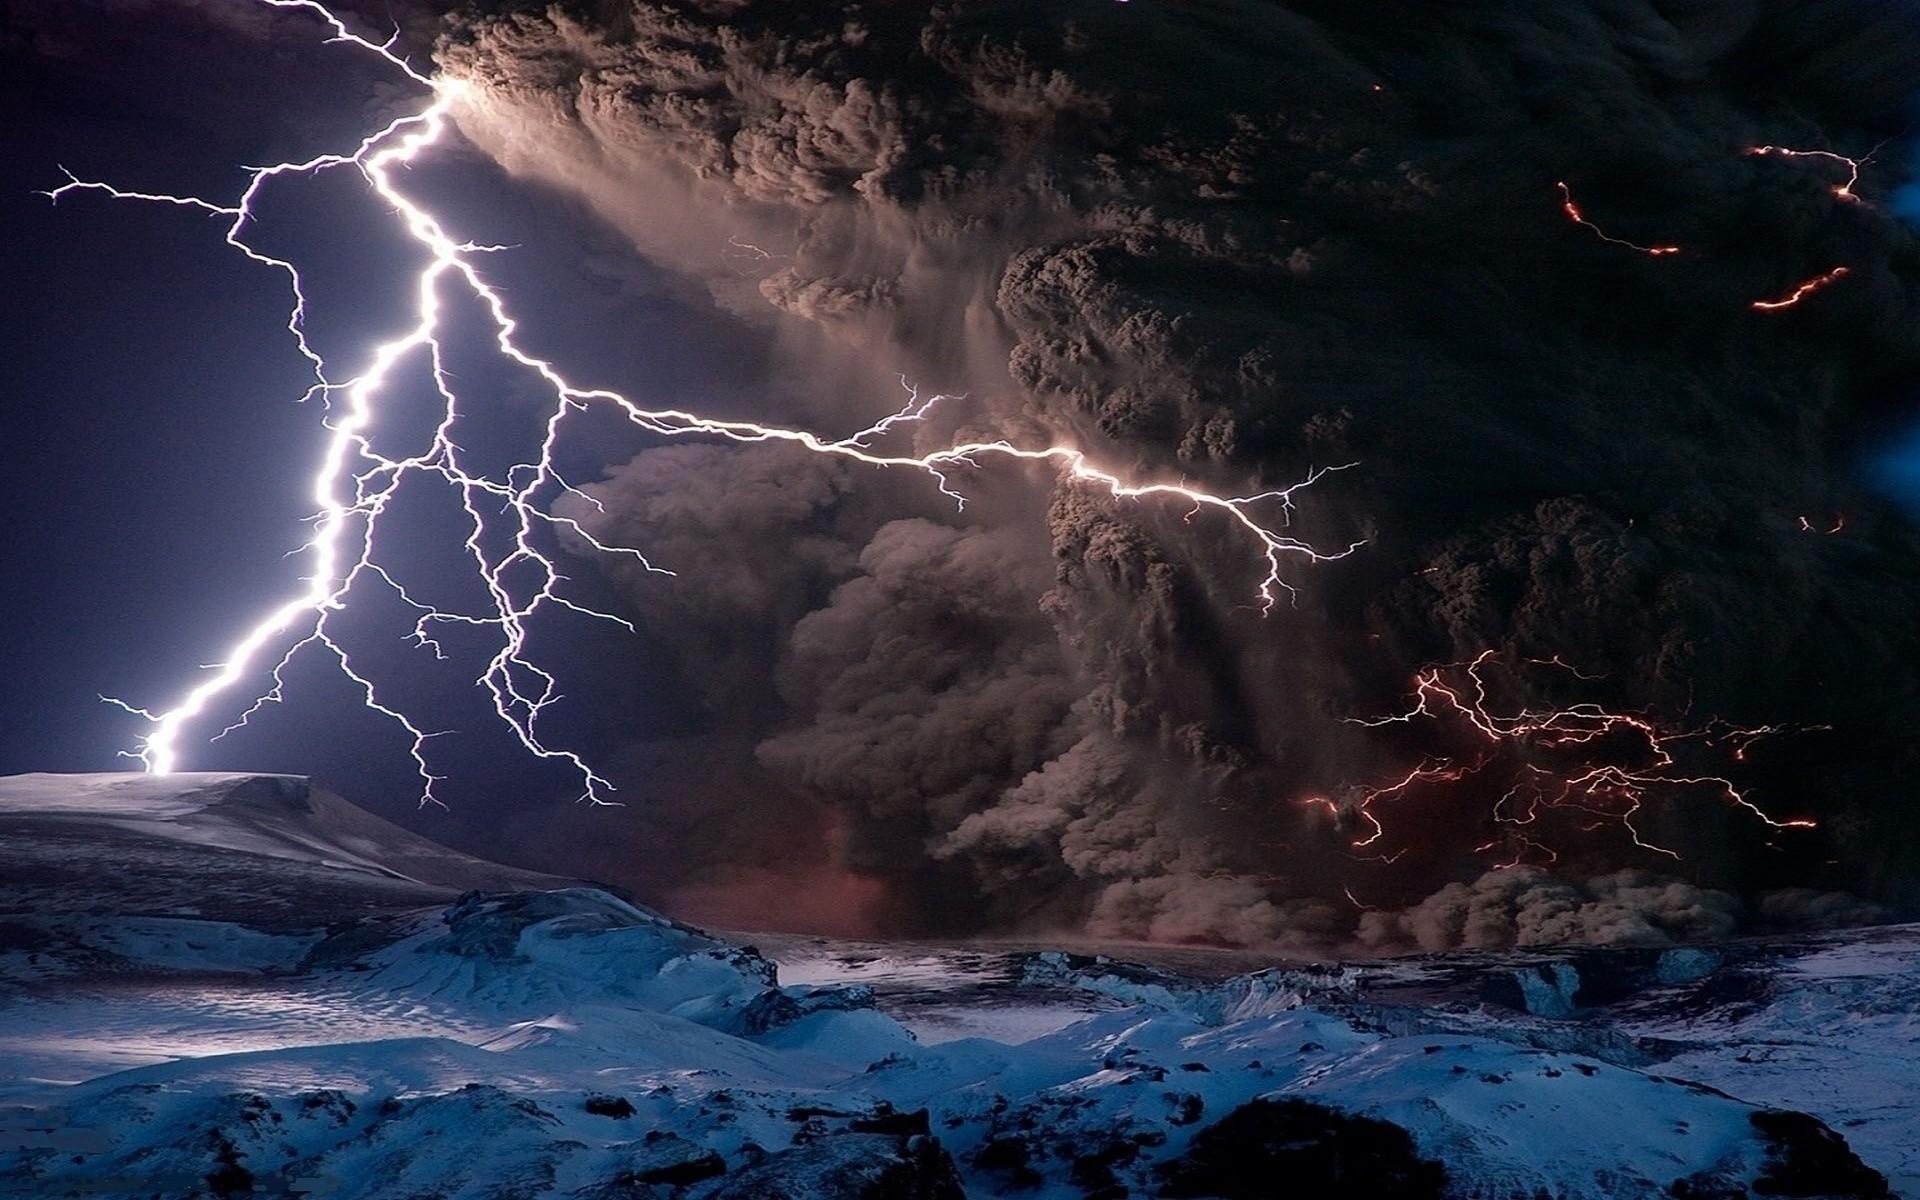 2560x1600 30 Wonderful Lightning Wallpapers HD Free Download